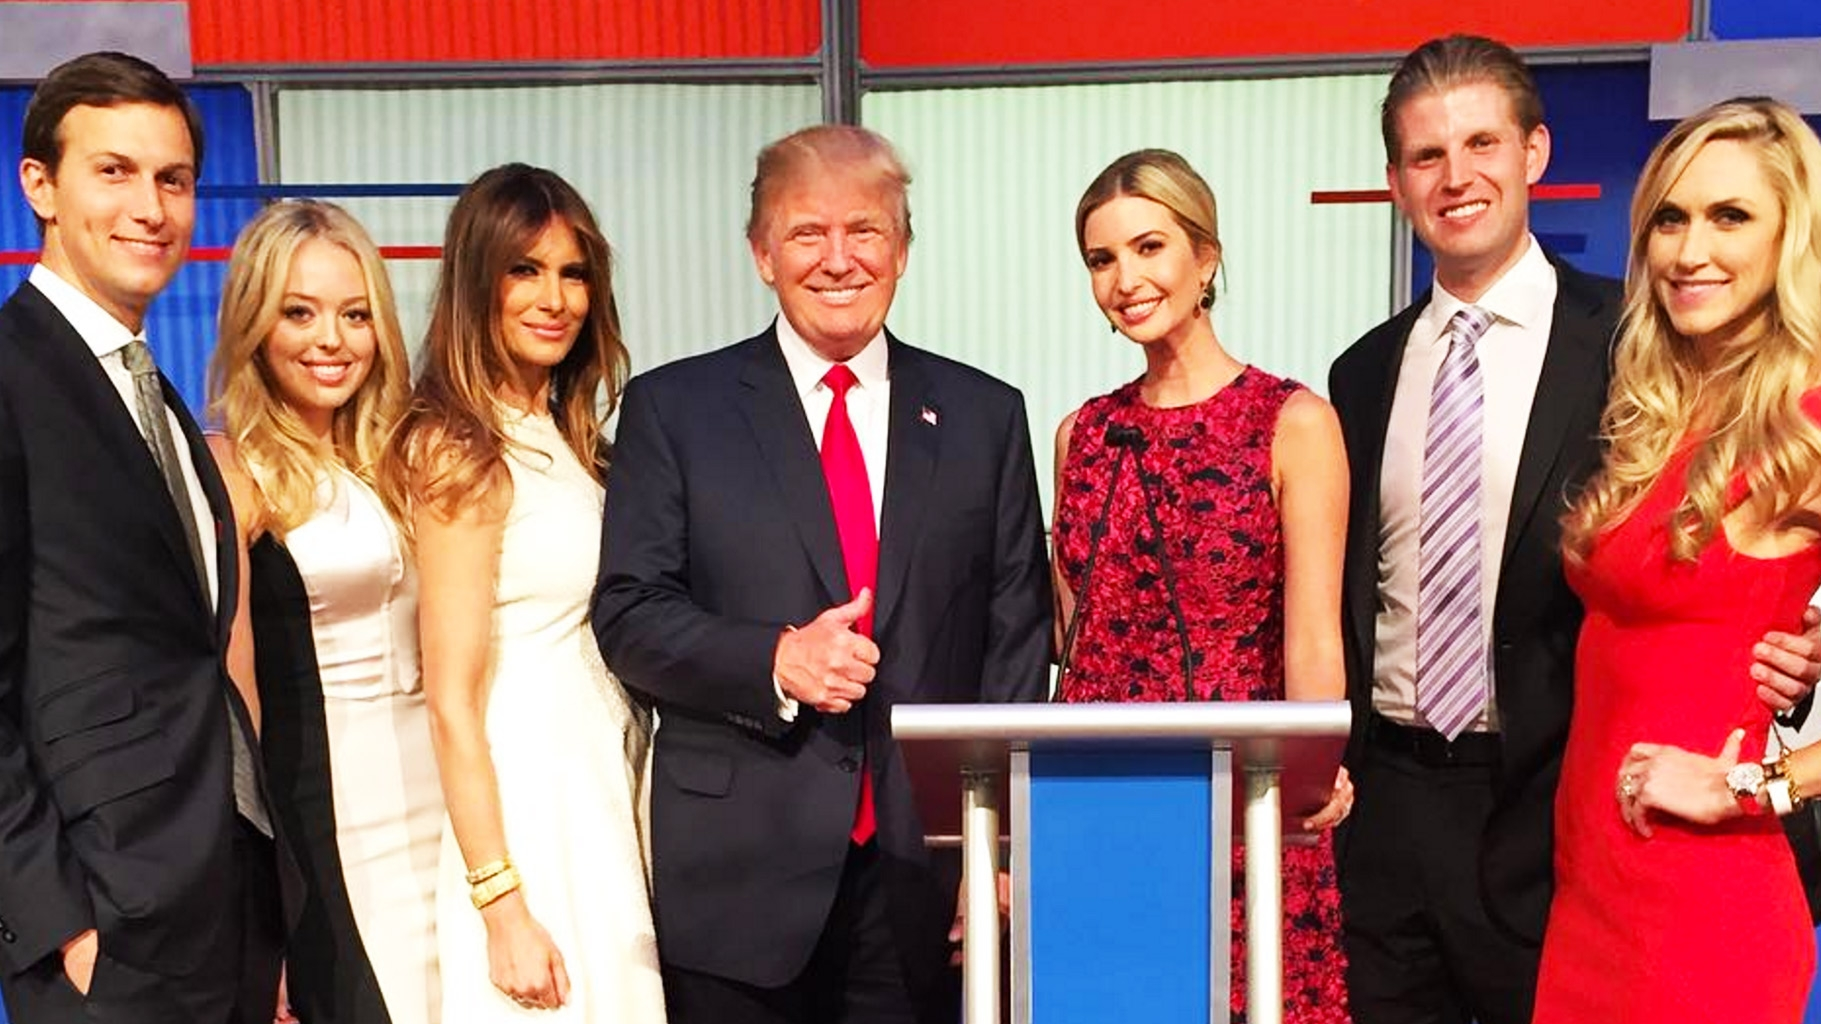 Ivanka Trump, Jared Kushner to Accompany Donald Trump to India